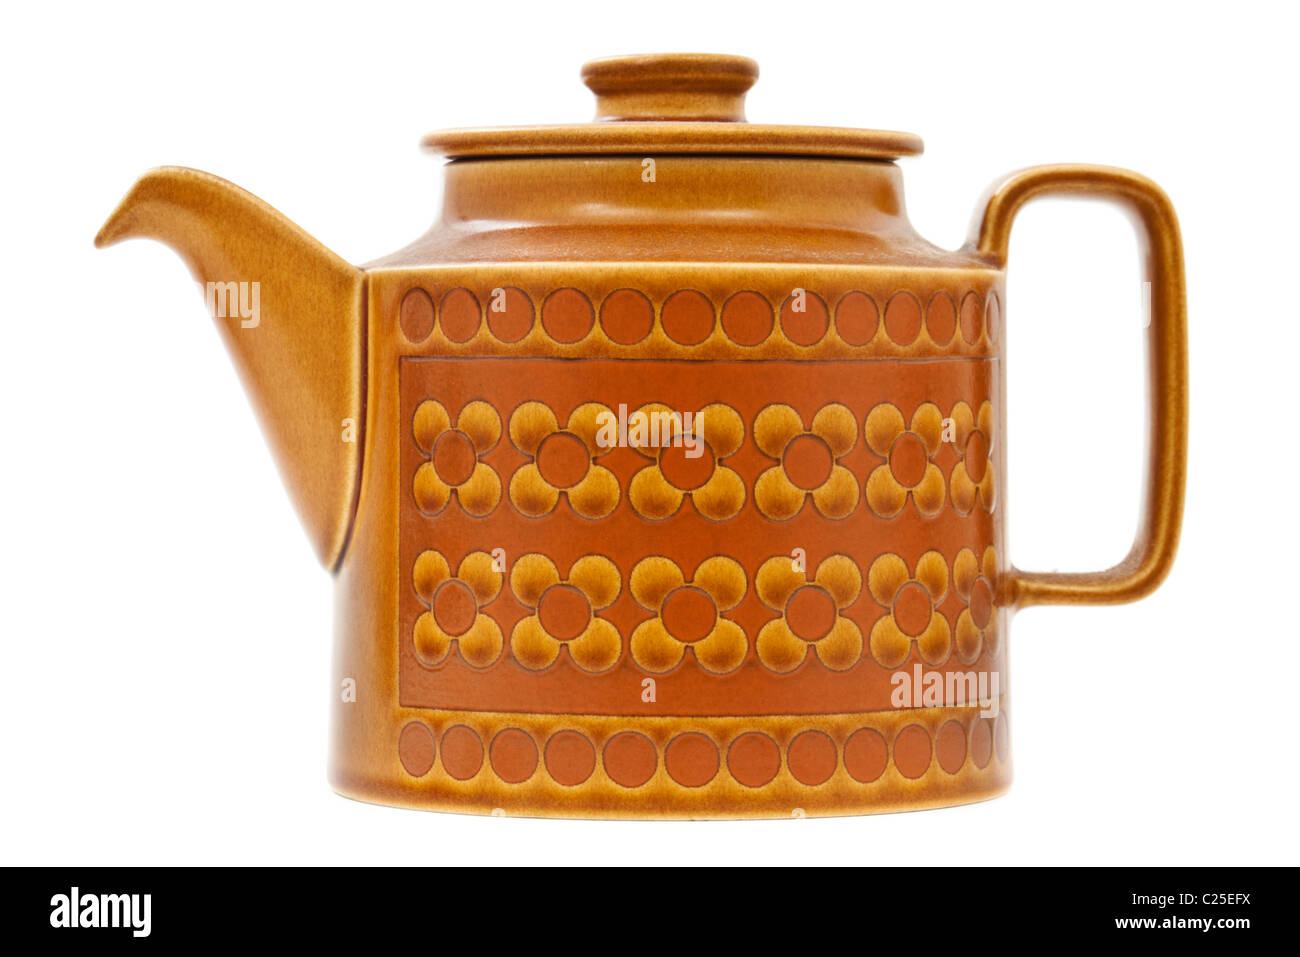 Retro 1970's Hornsea pottery 'Saffron' ceramic teapot - Stock Image